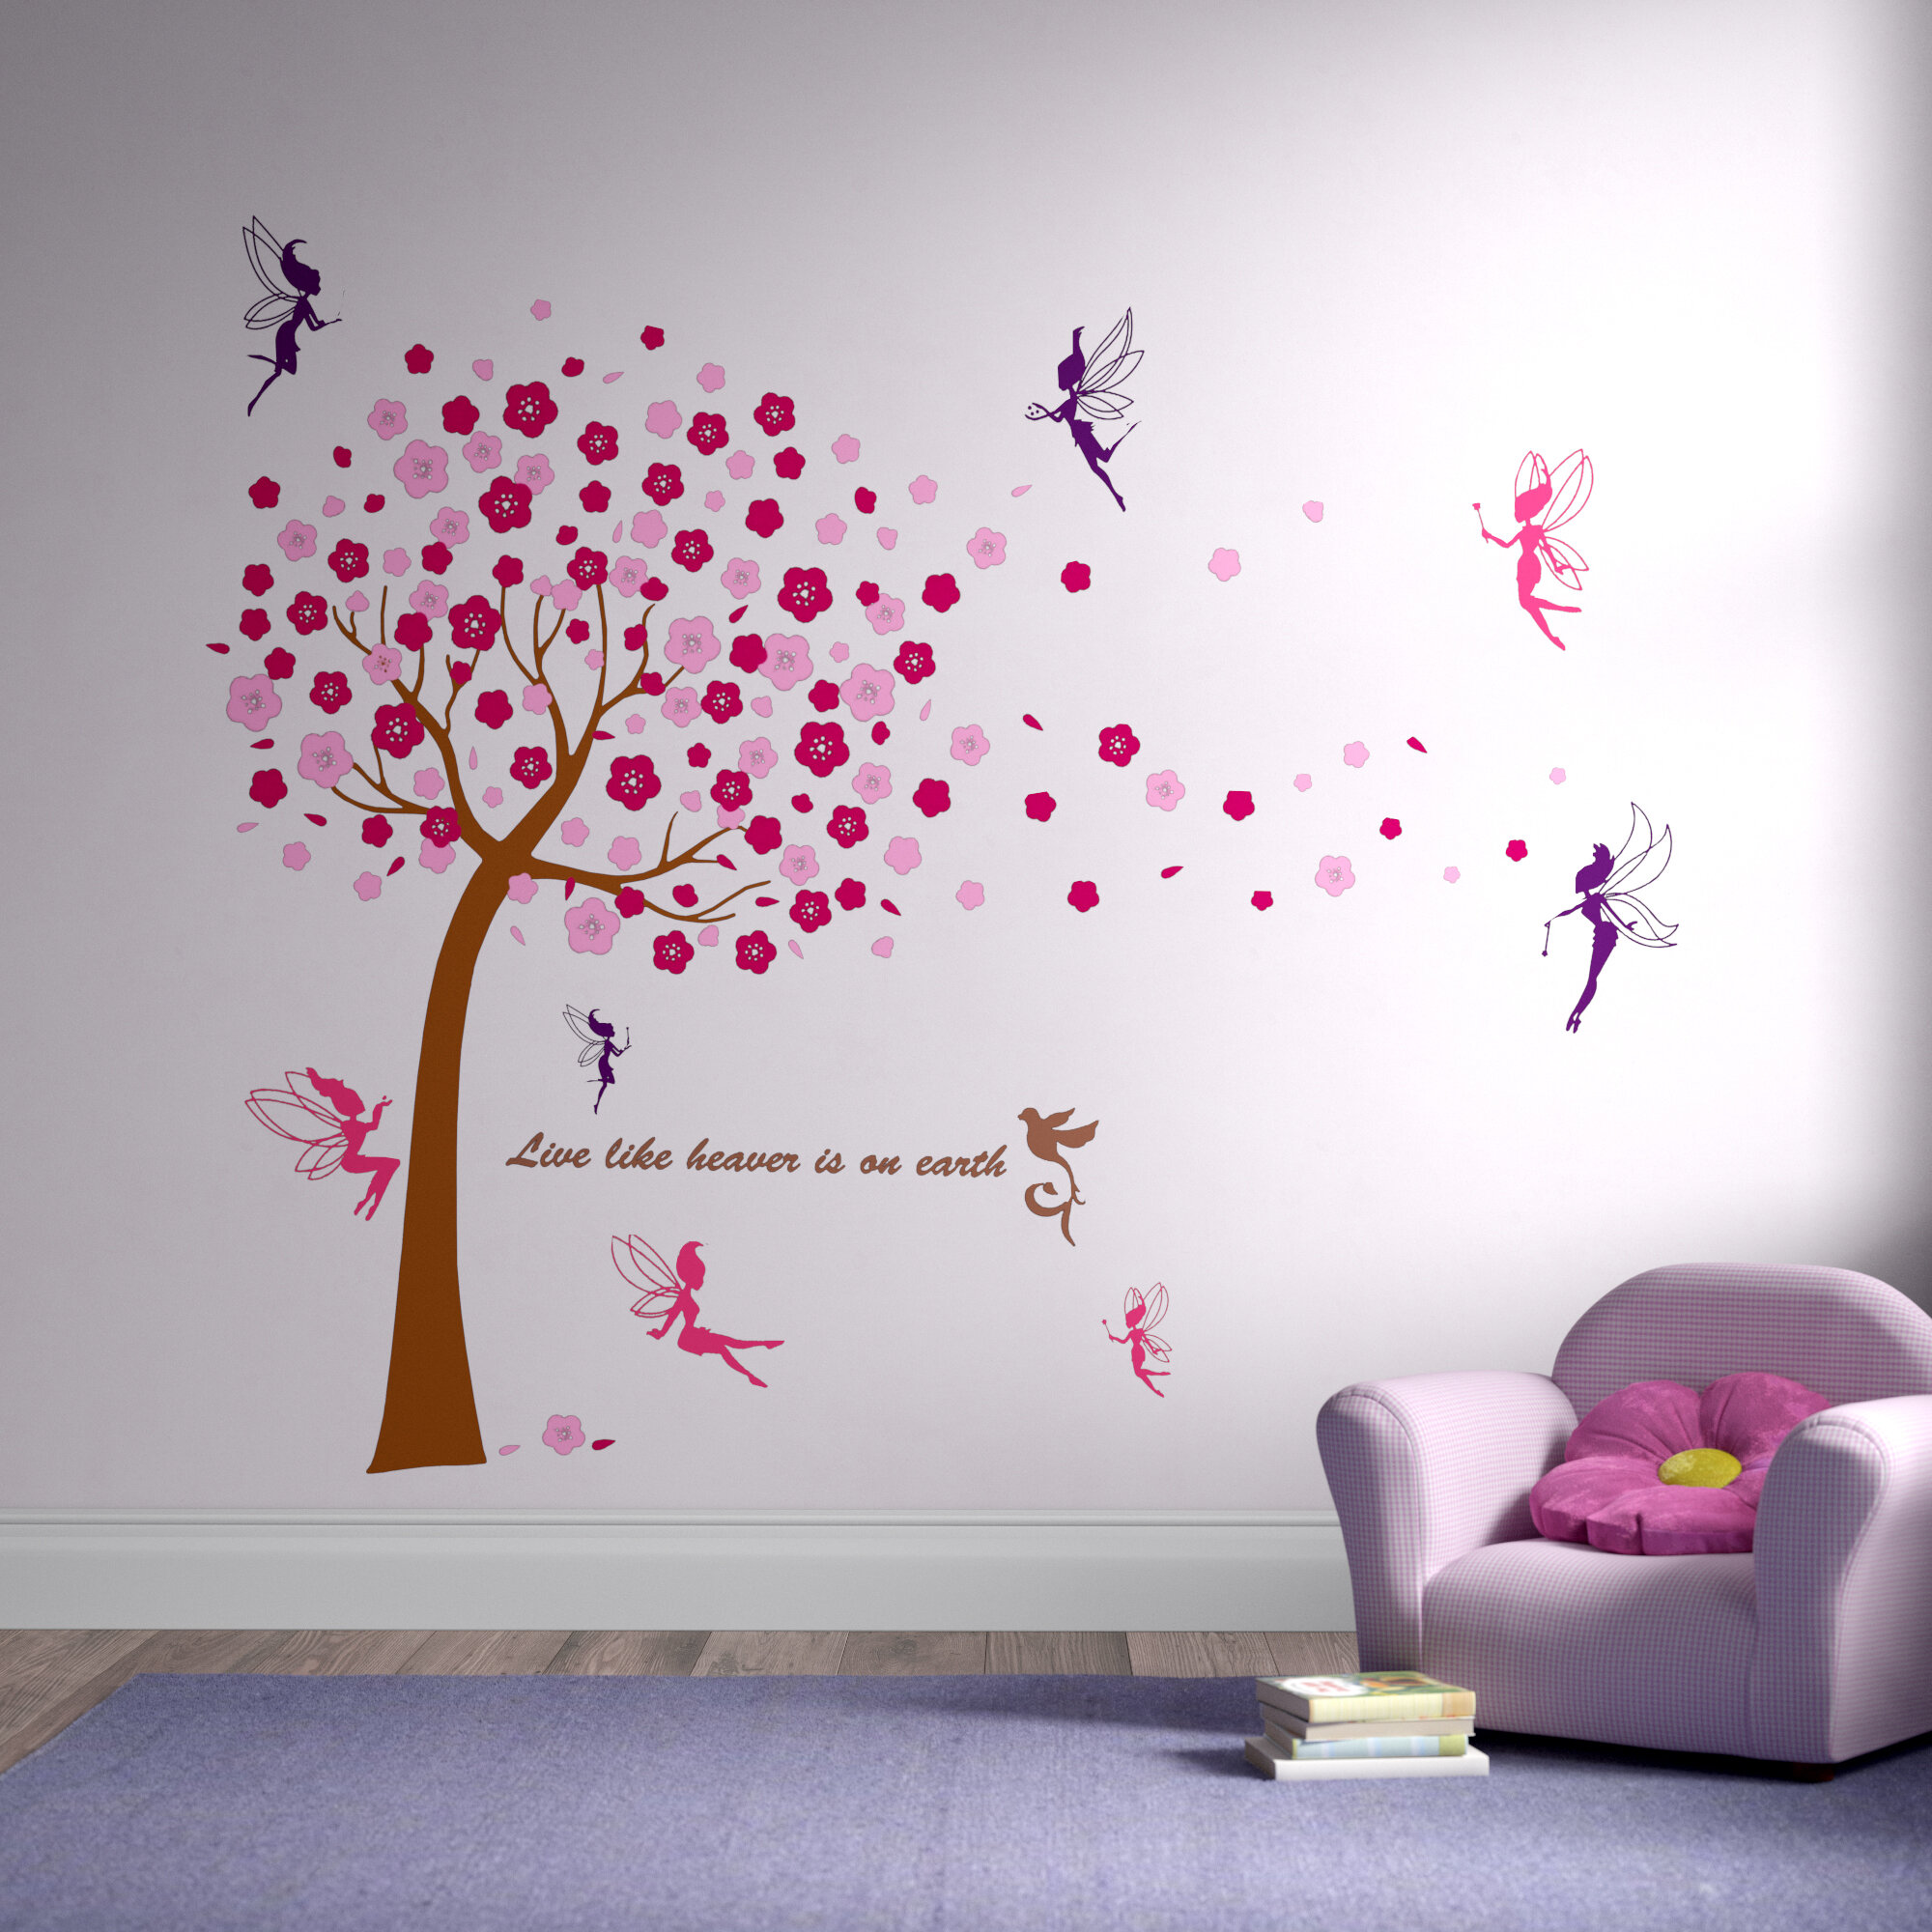 Wall Sticker Waterproof Colourful Flower Bird Cage Butterfly Practical